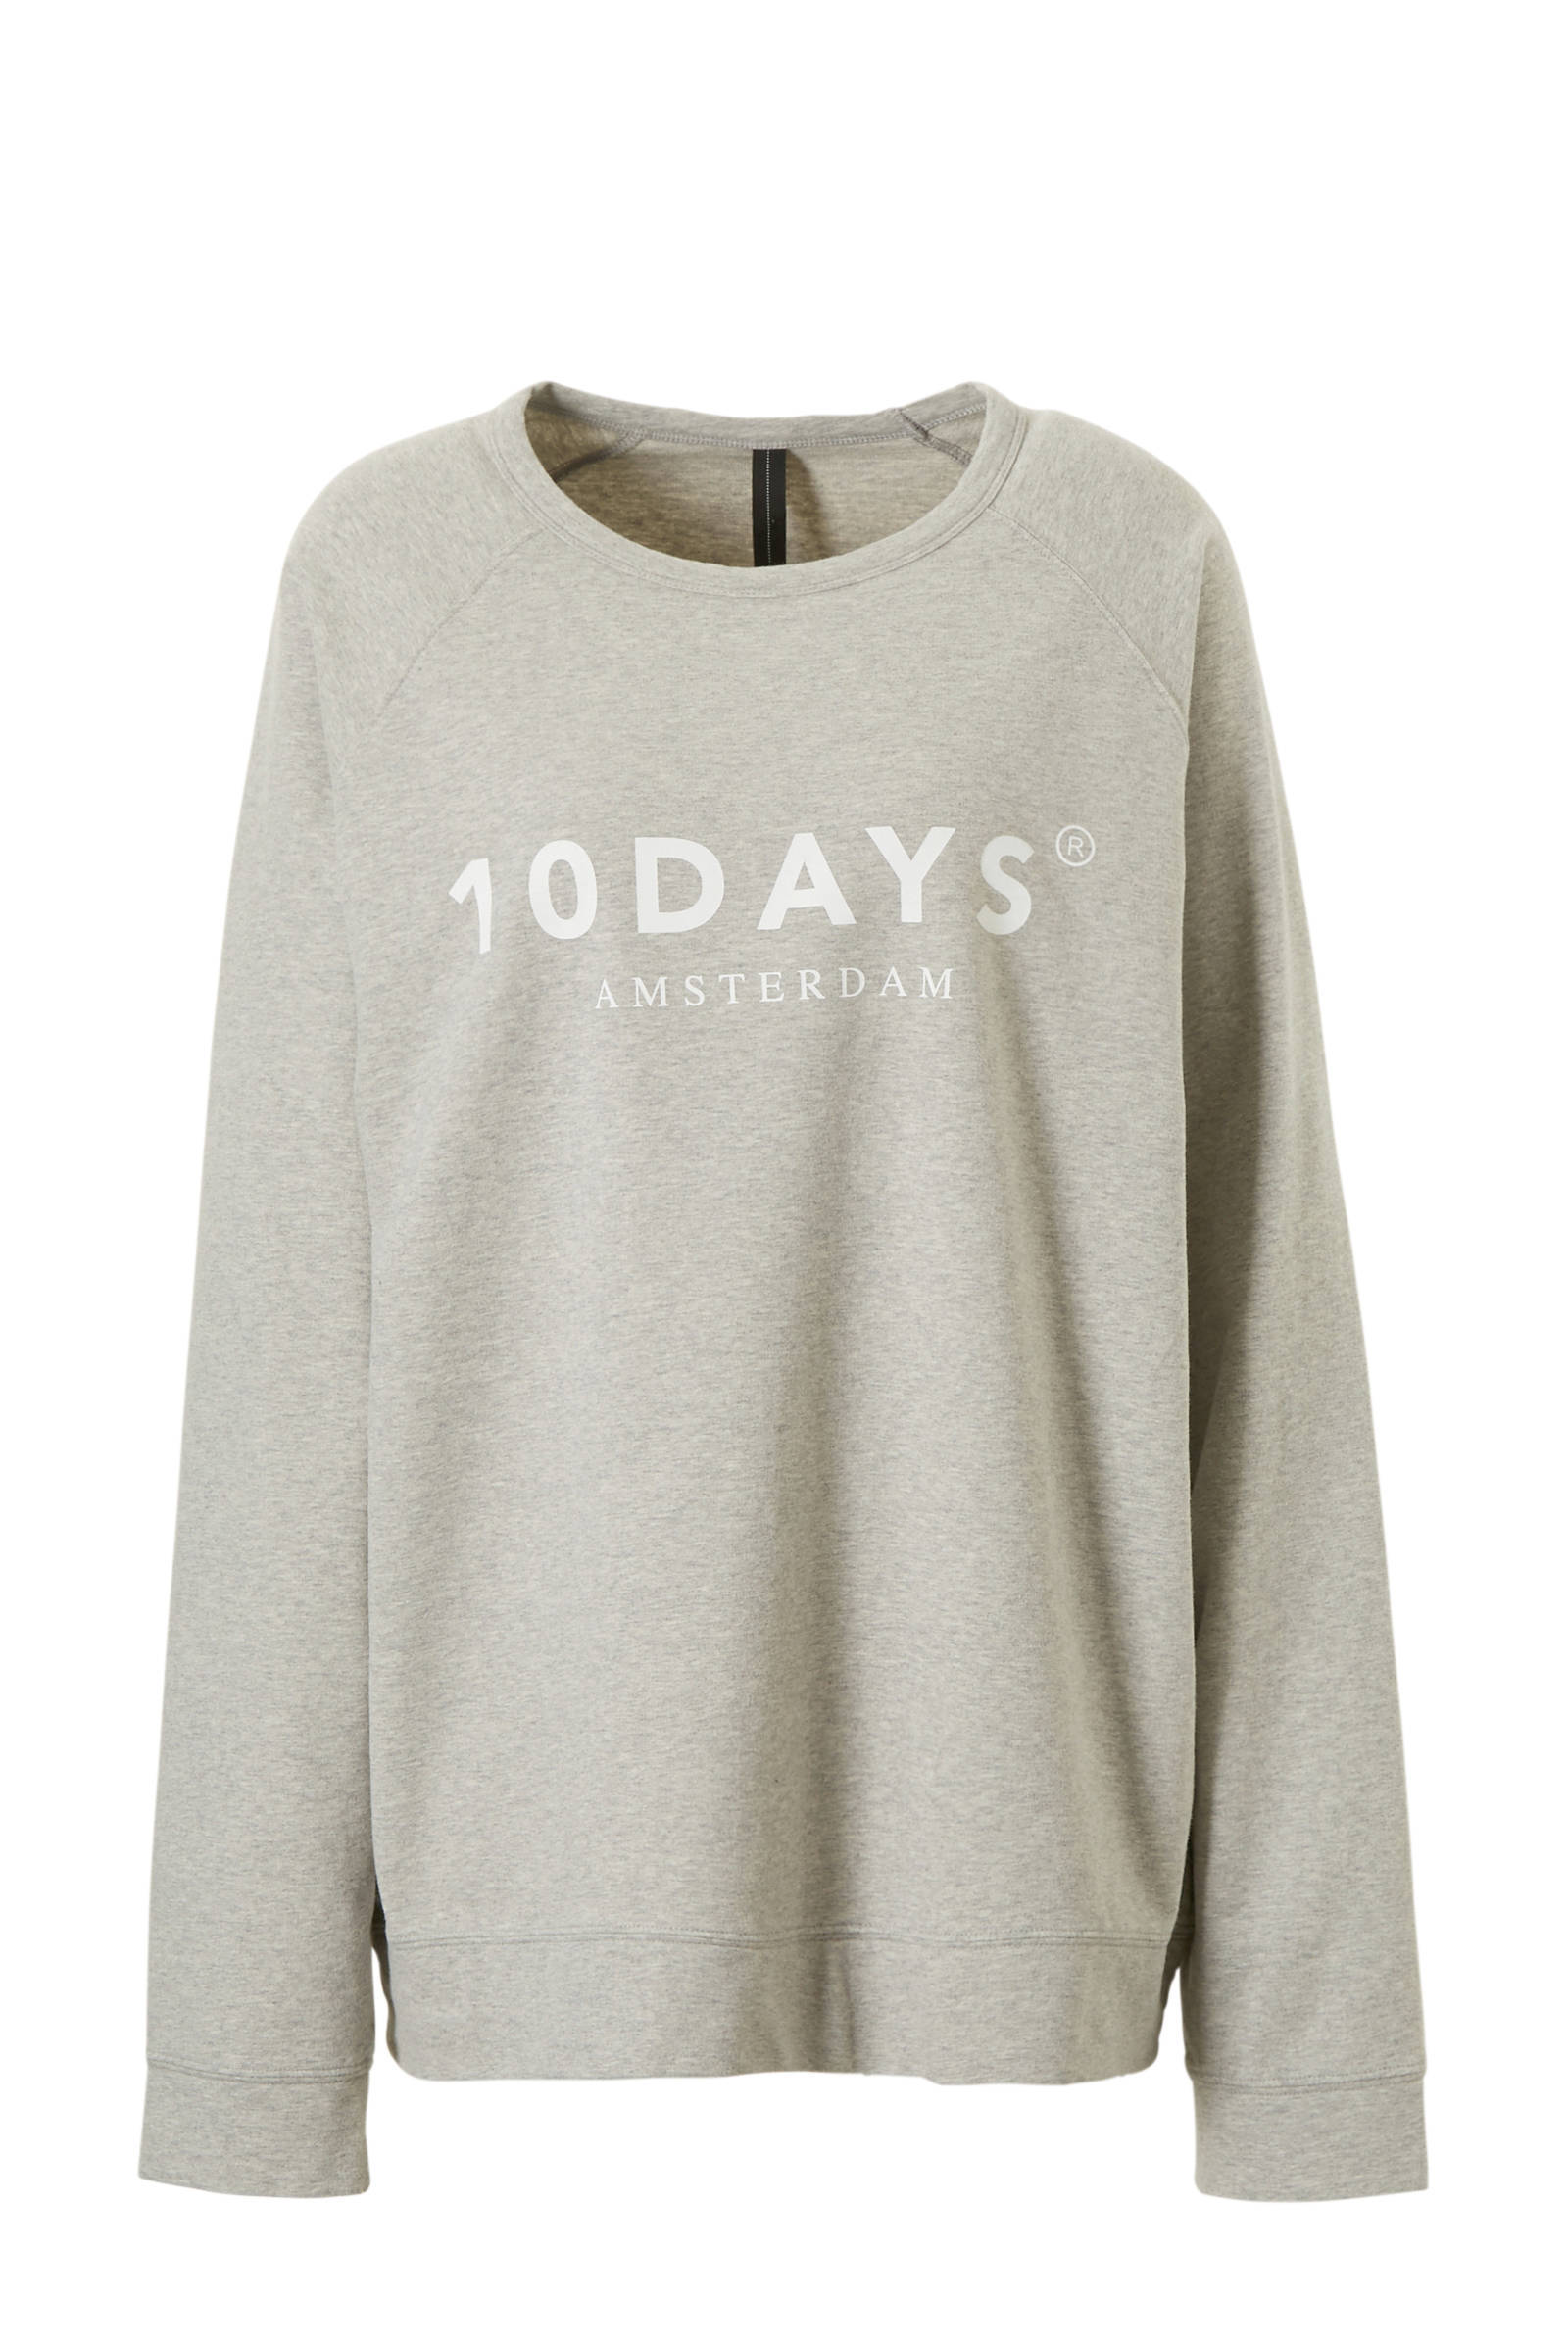 10DAYS trui met printopdruk witzwart | wehkamp